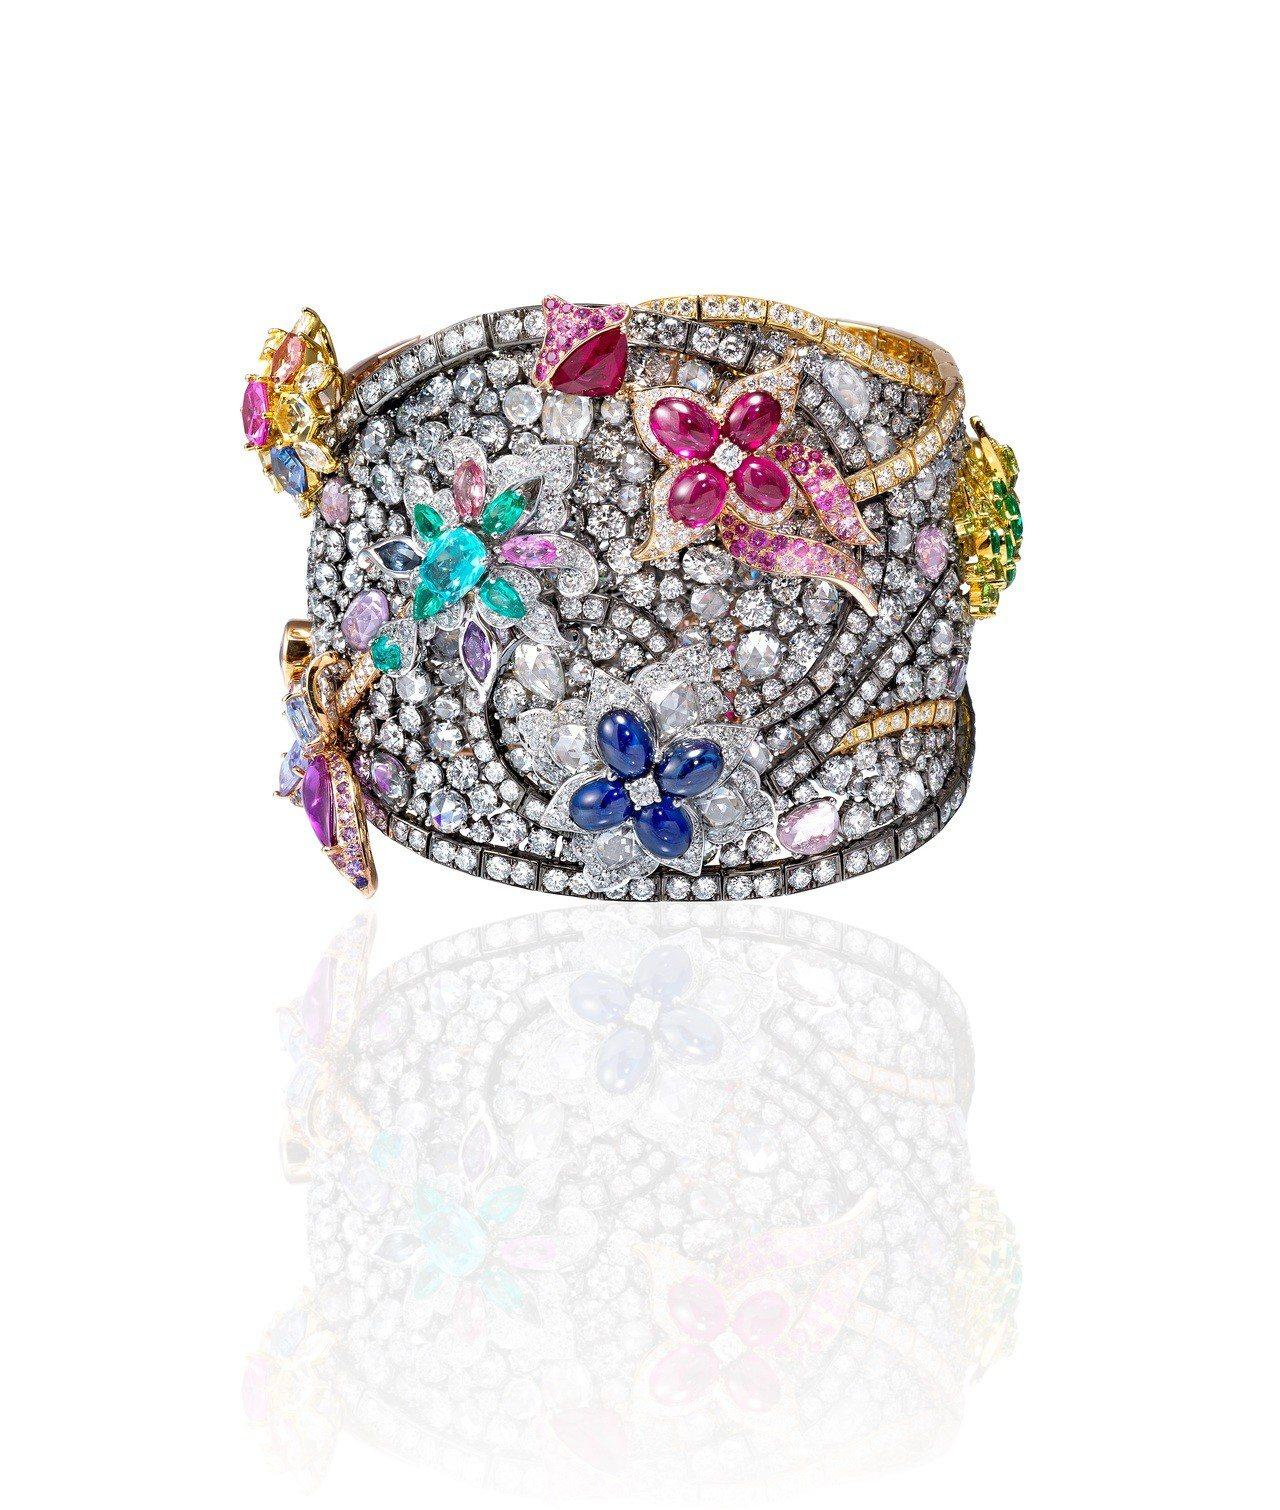 Anna Hu聖巴西爾音樂手環,以黃鑽、帕拉伊巴碧璽、翠榴石、彩色剛玉、鉻碧璽、...